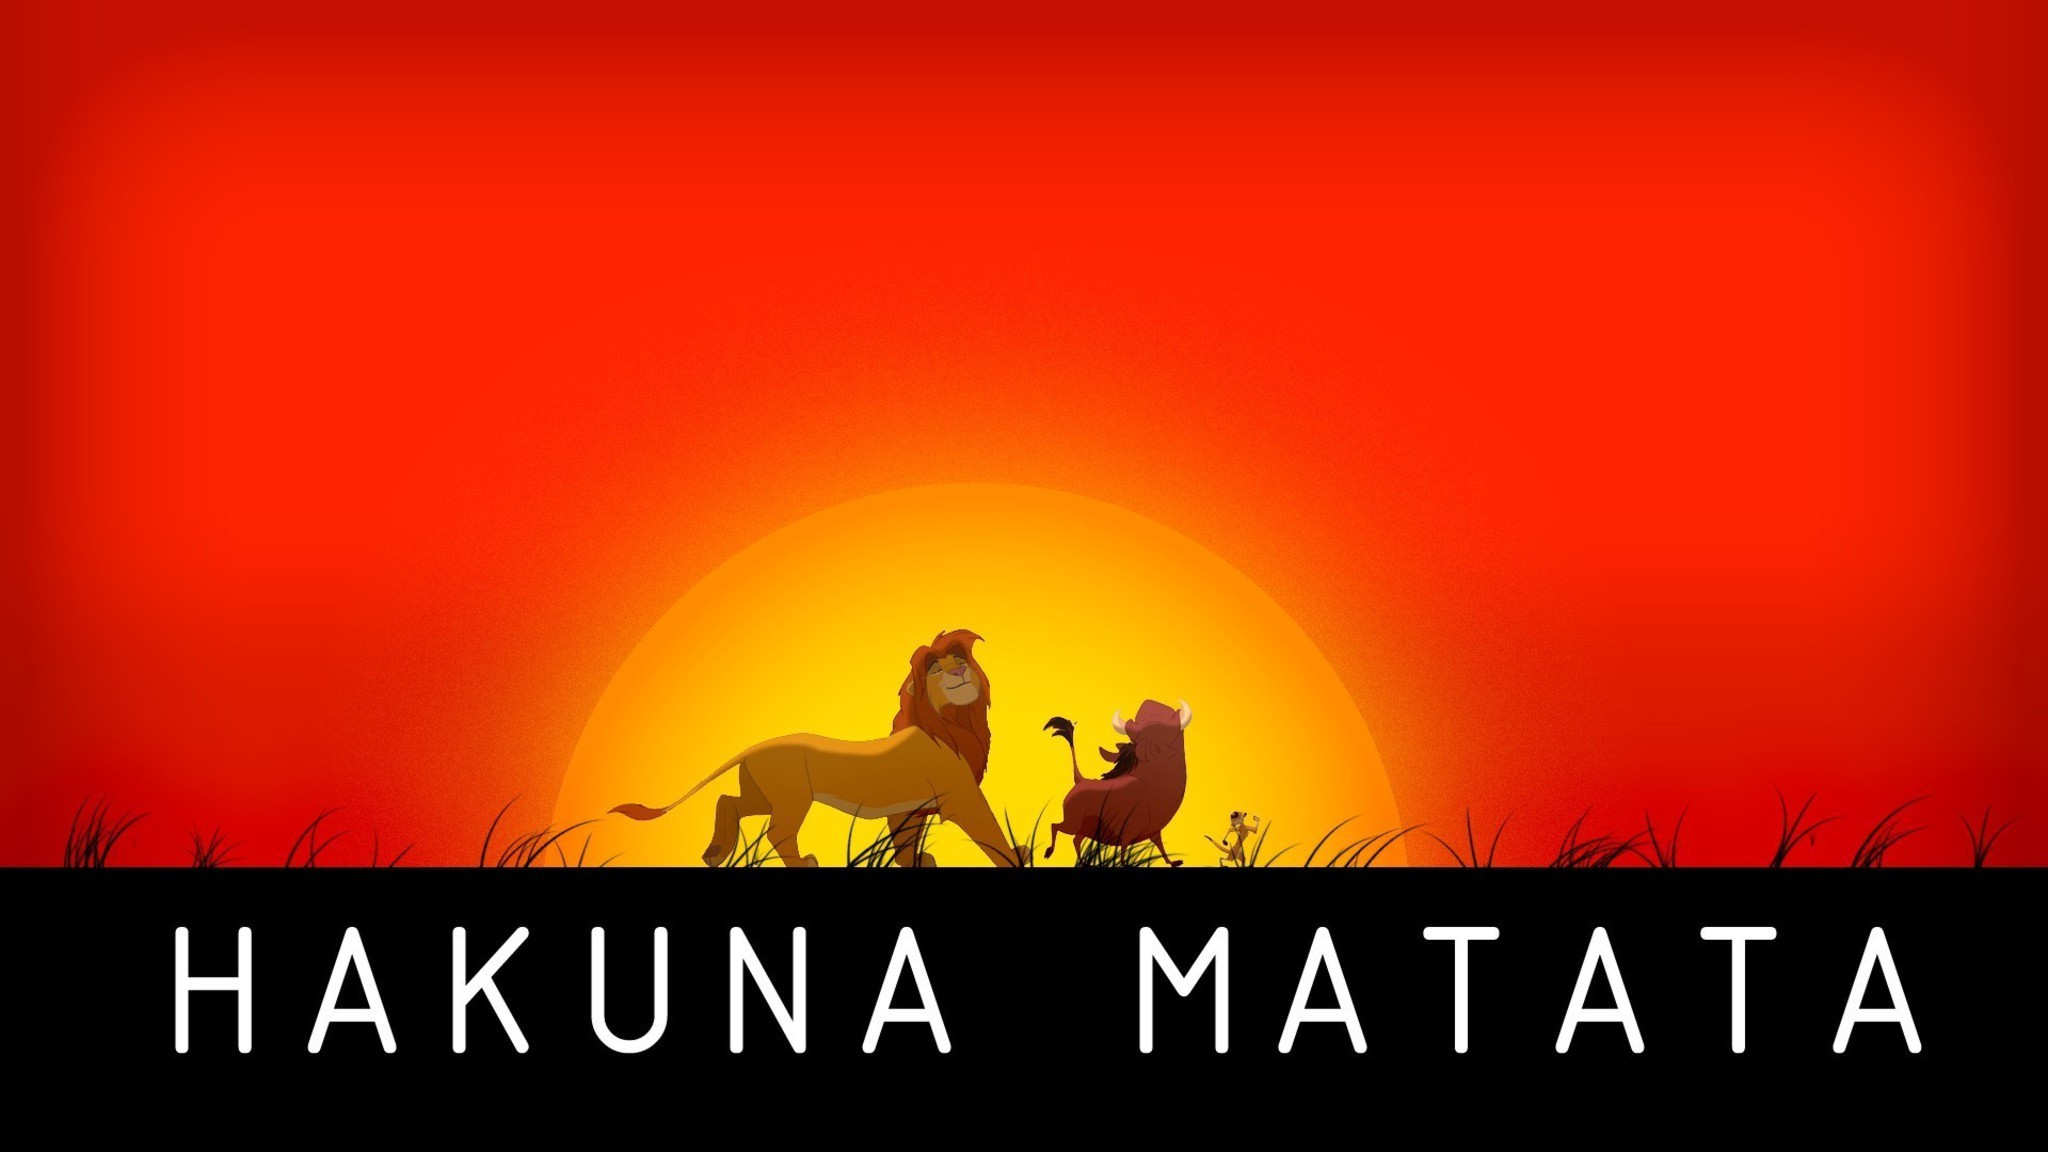 Hakuna Matata Wallpaper 183 ①